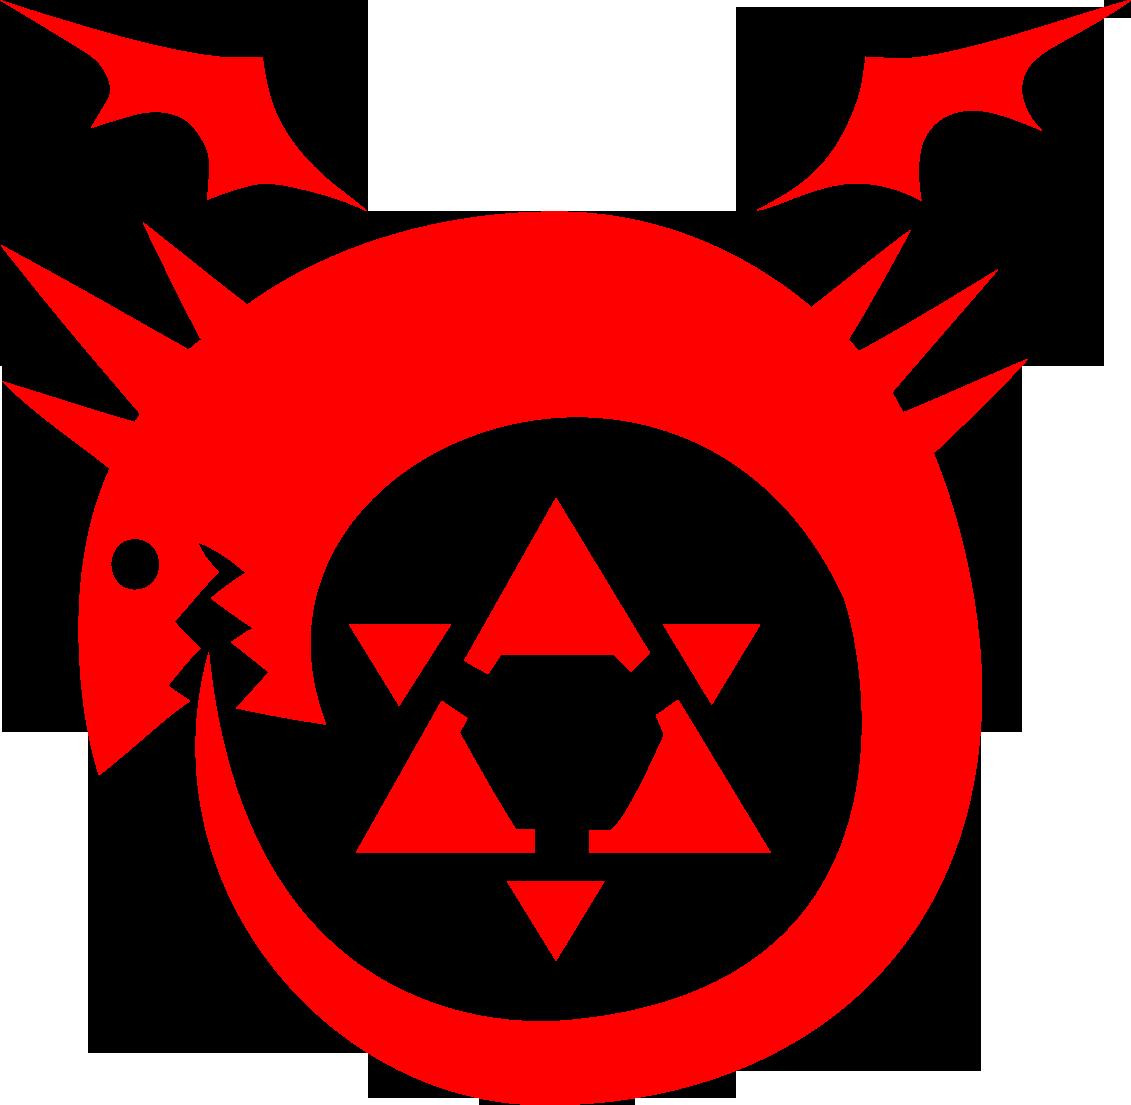 All For Lust 2003 homunculi (fullmetal alchemist) | villains wiki | fandom